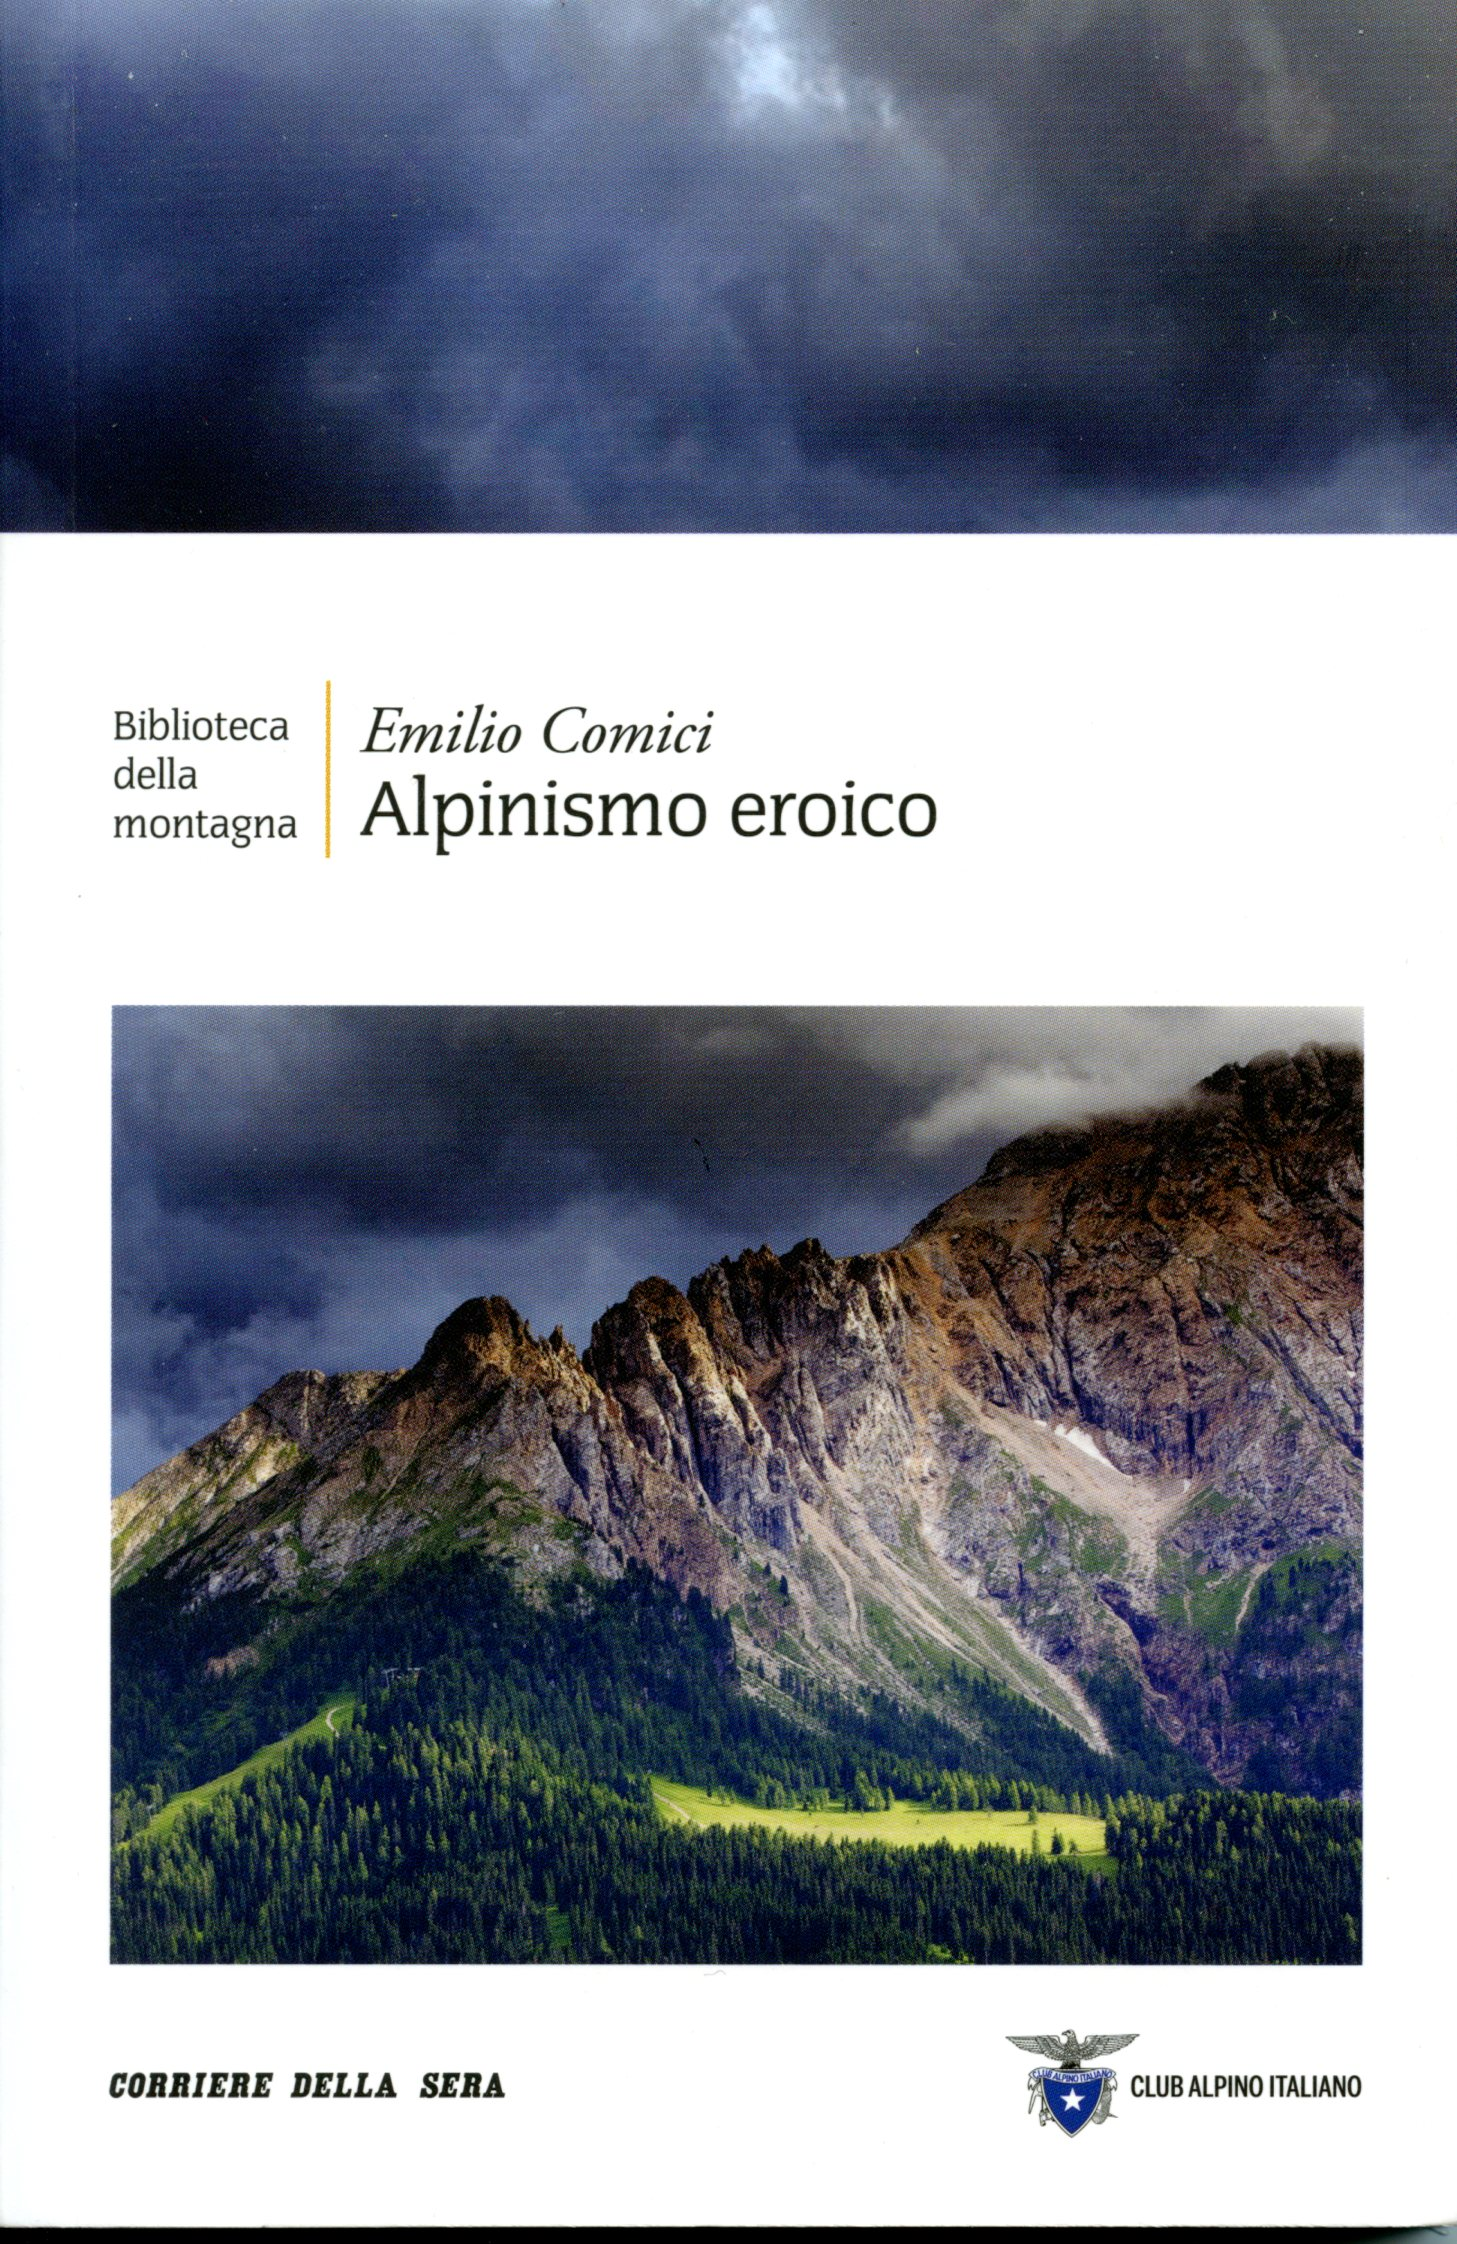 Alpinismo eroico